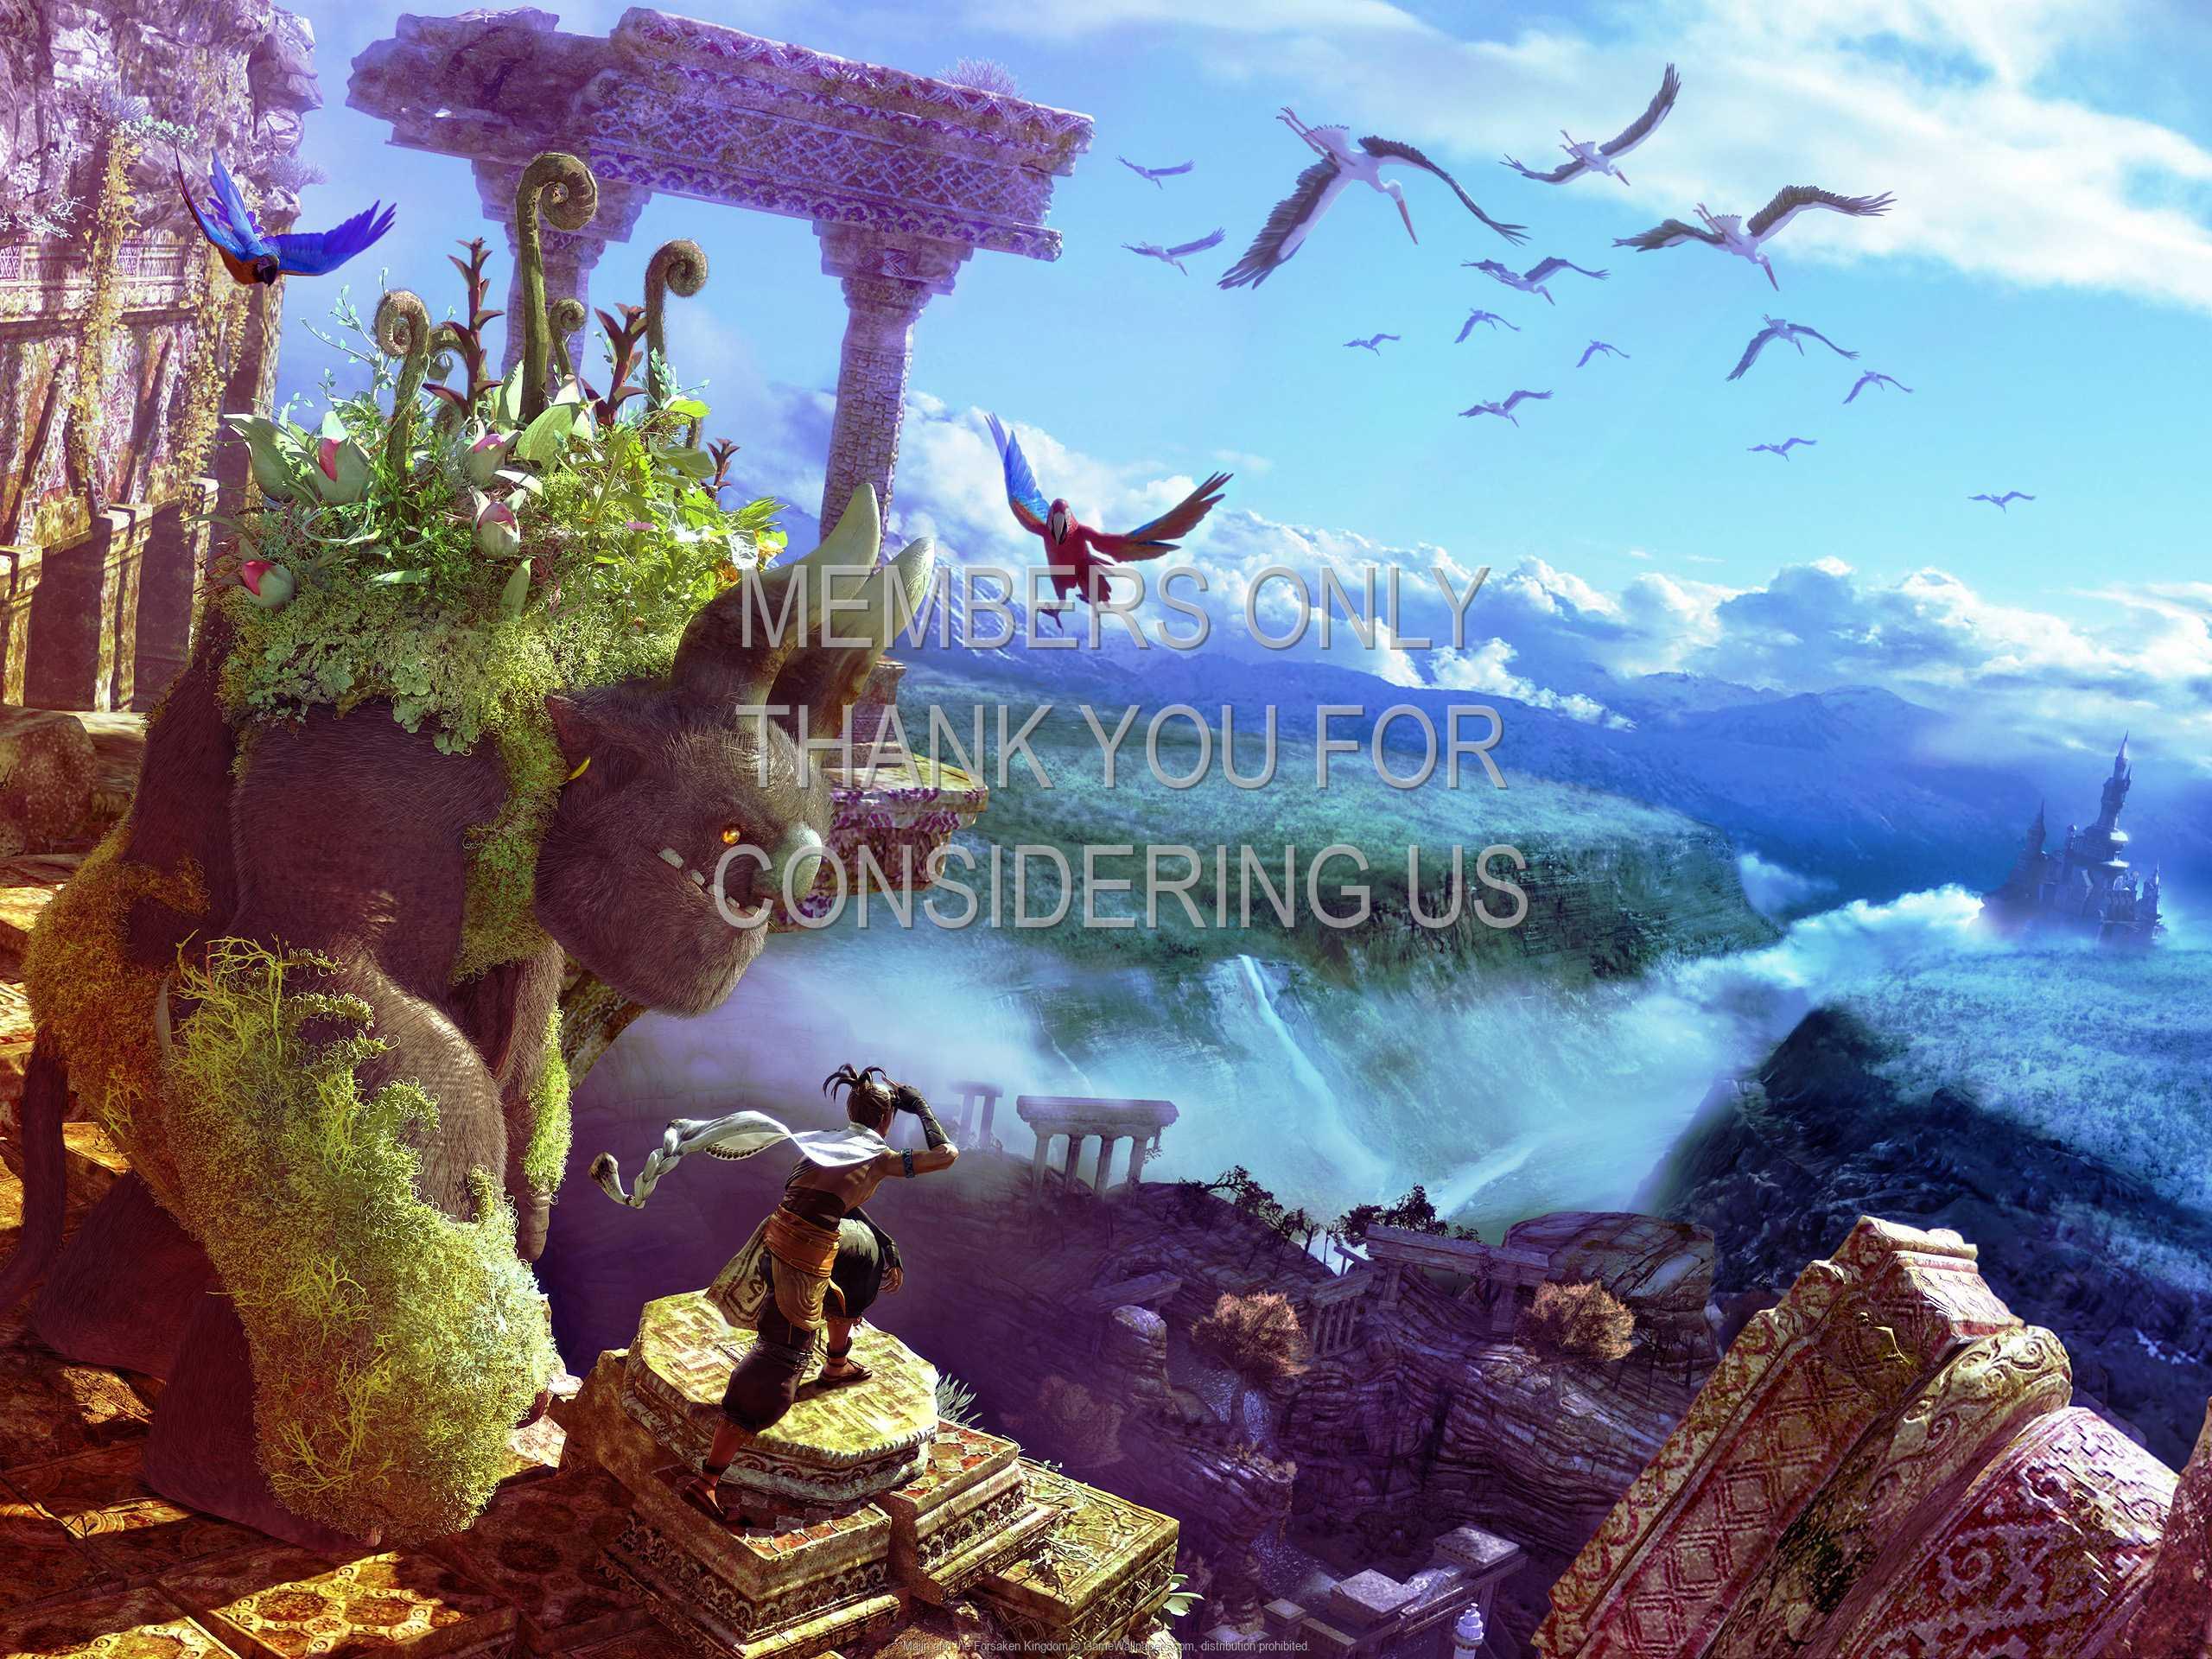 Majin and the Forsaken Kingdom 1080p Horizontal Handy Hintergrundbild 03